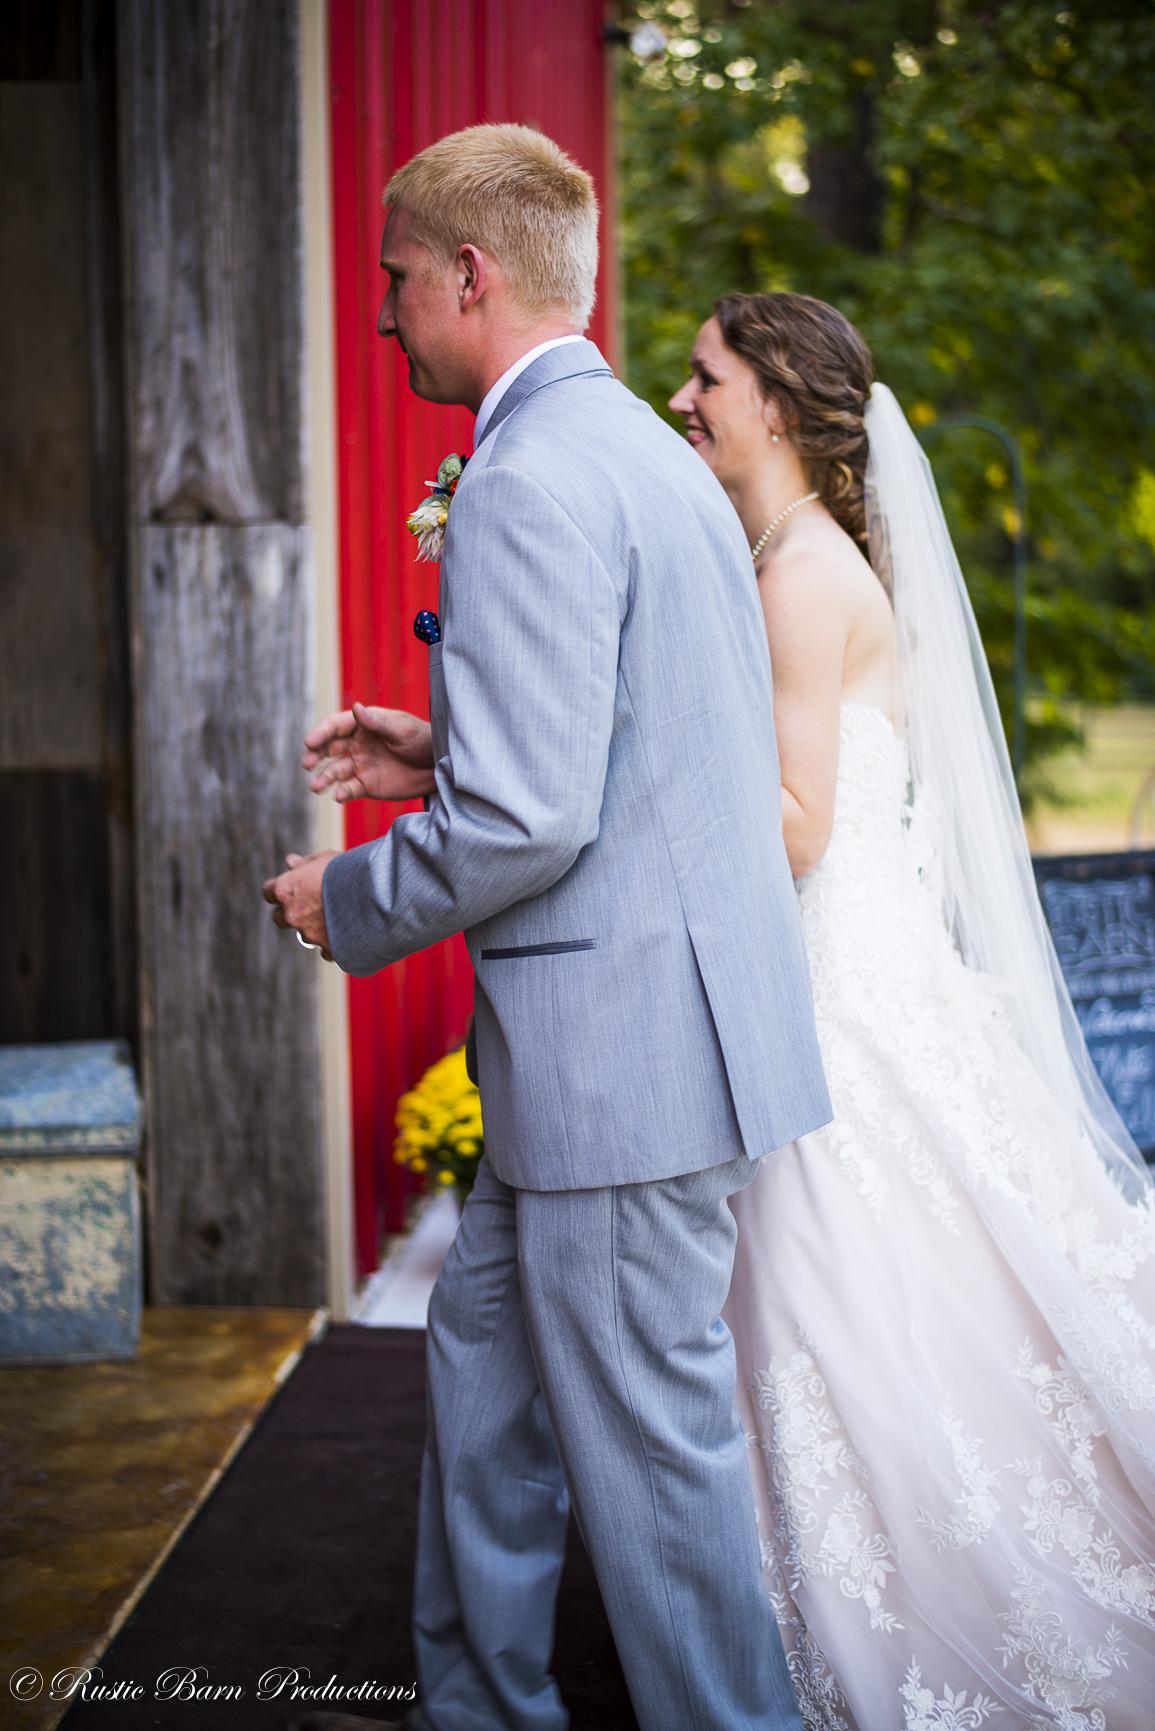 Shelby and Nates wedding-9509.jpg